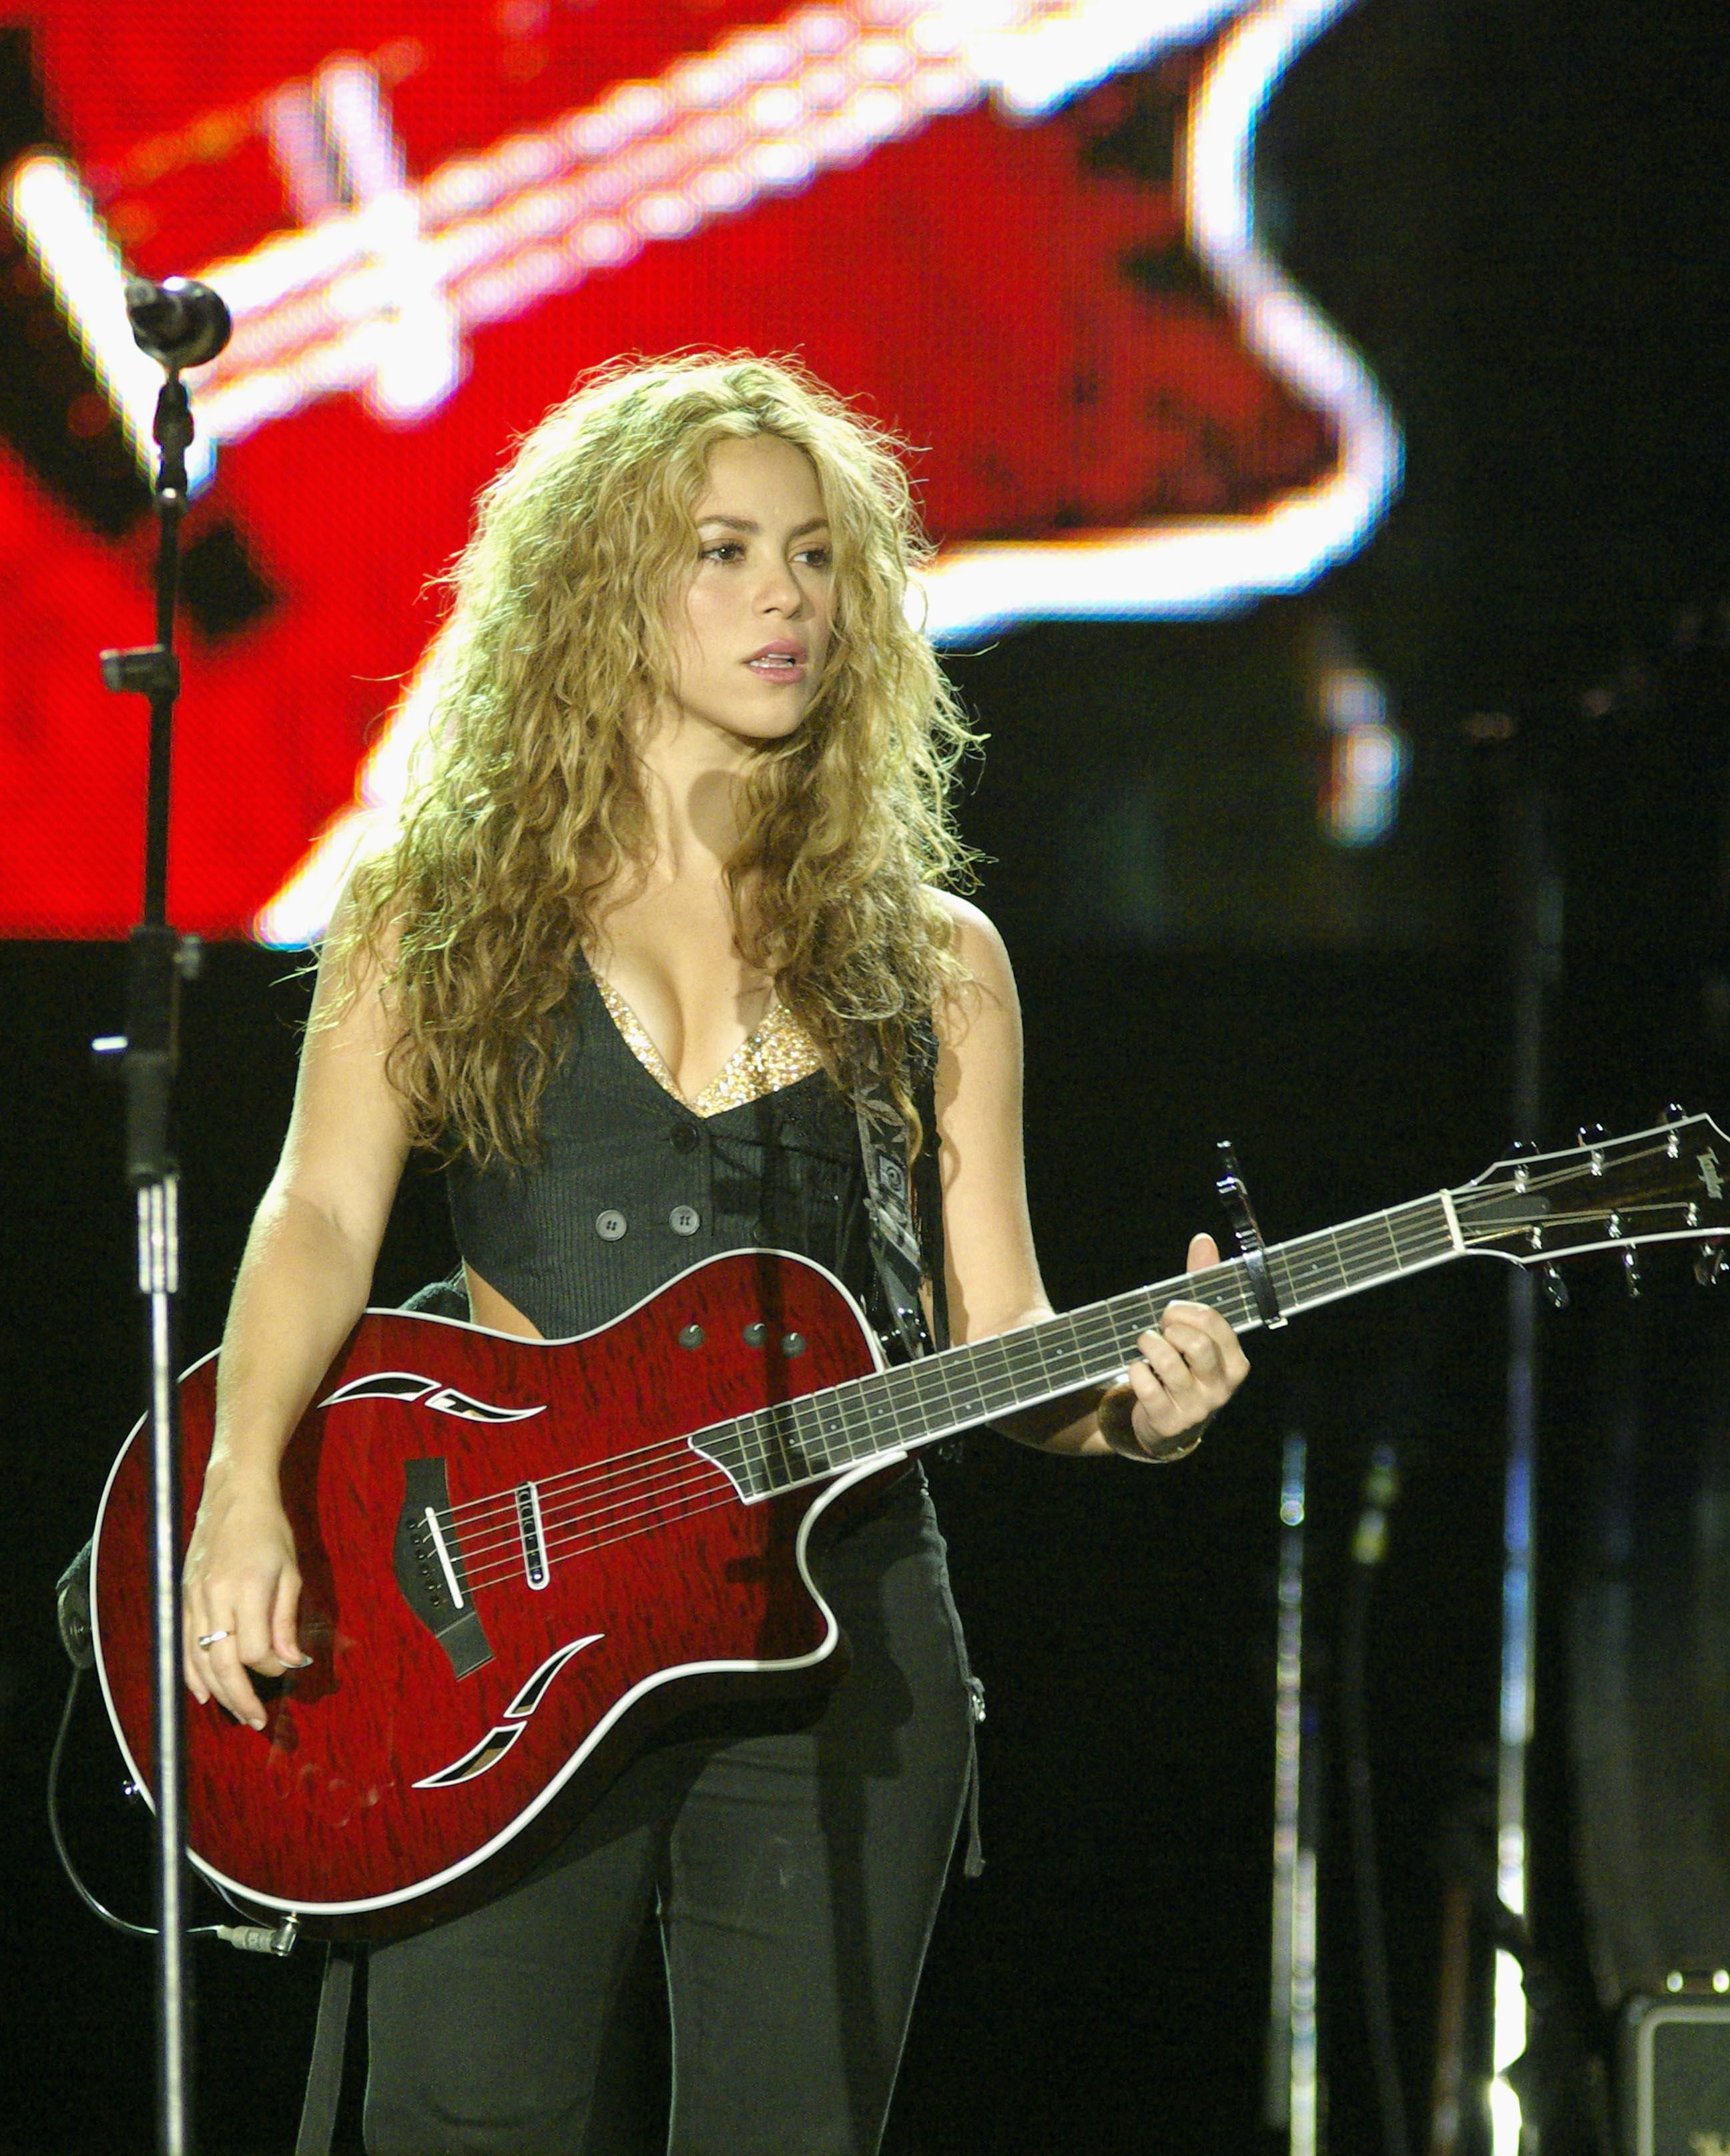 File:Shakira Rio 03.jpg - Wikipedia Shakira